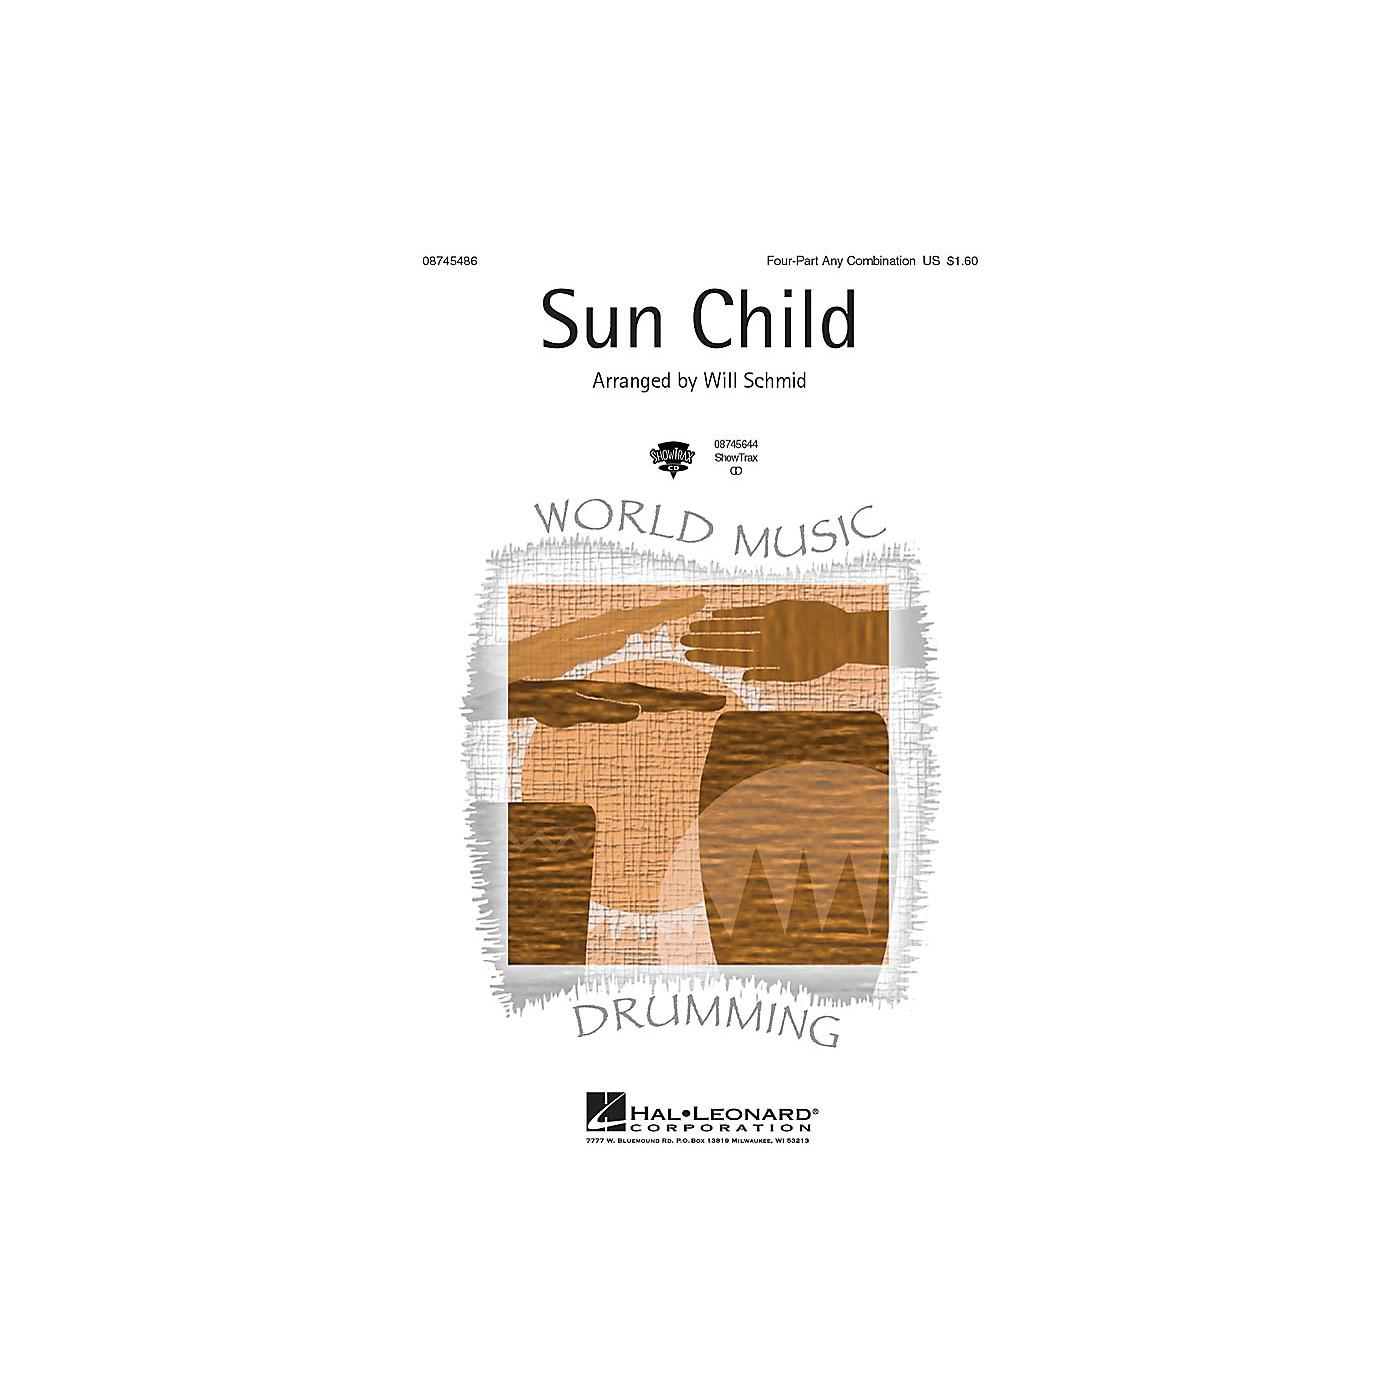 Hal Leonard Sun Child 4 Part Any Combination arranged by Will Schmid thumbnail